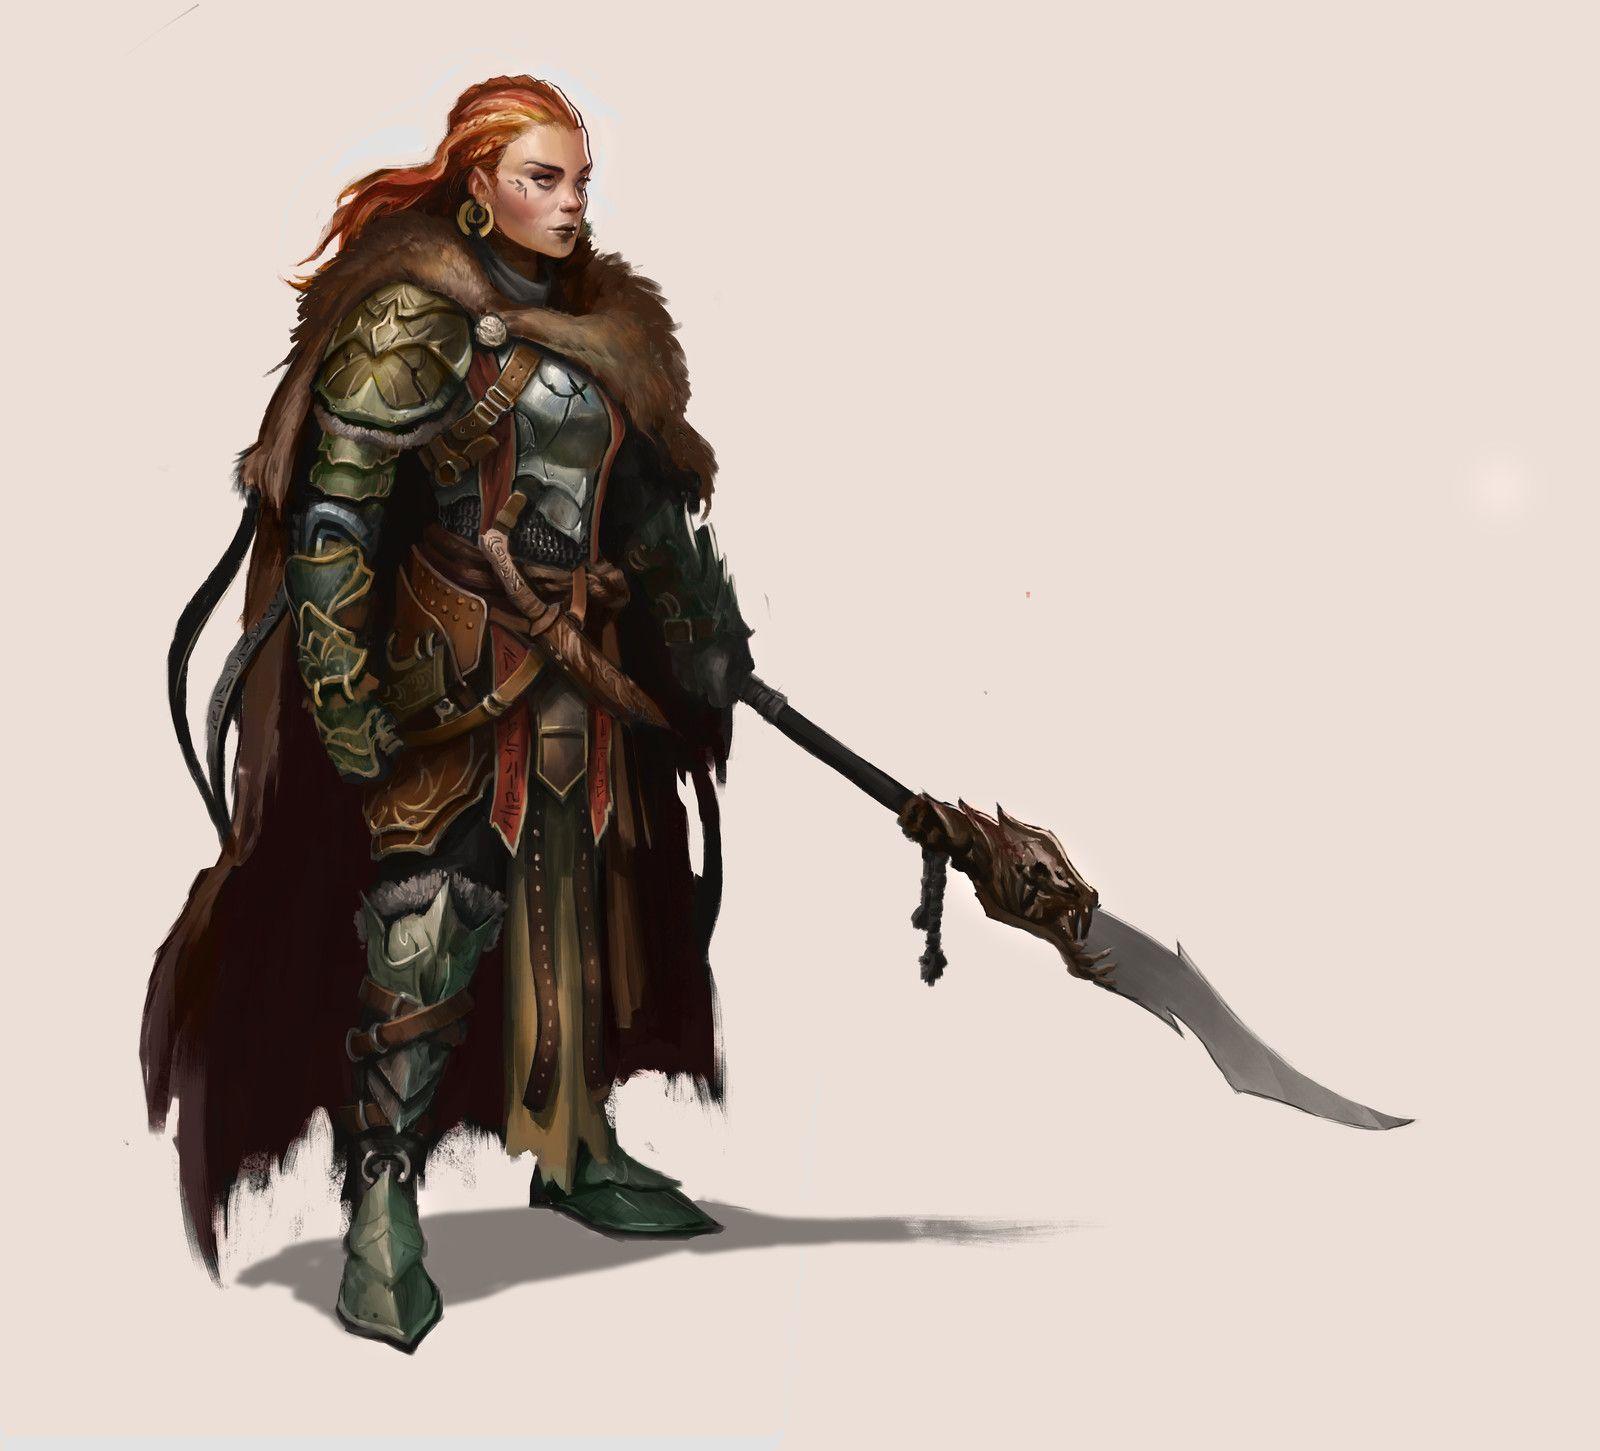 Redhead, Howard Pak on ArtStation at https://www.artstation.com/artwork/dg23Q